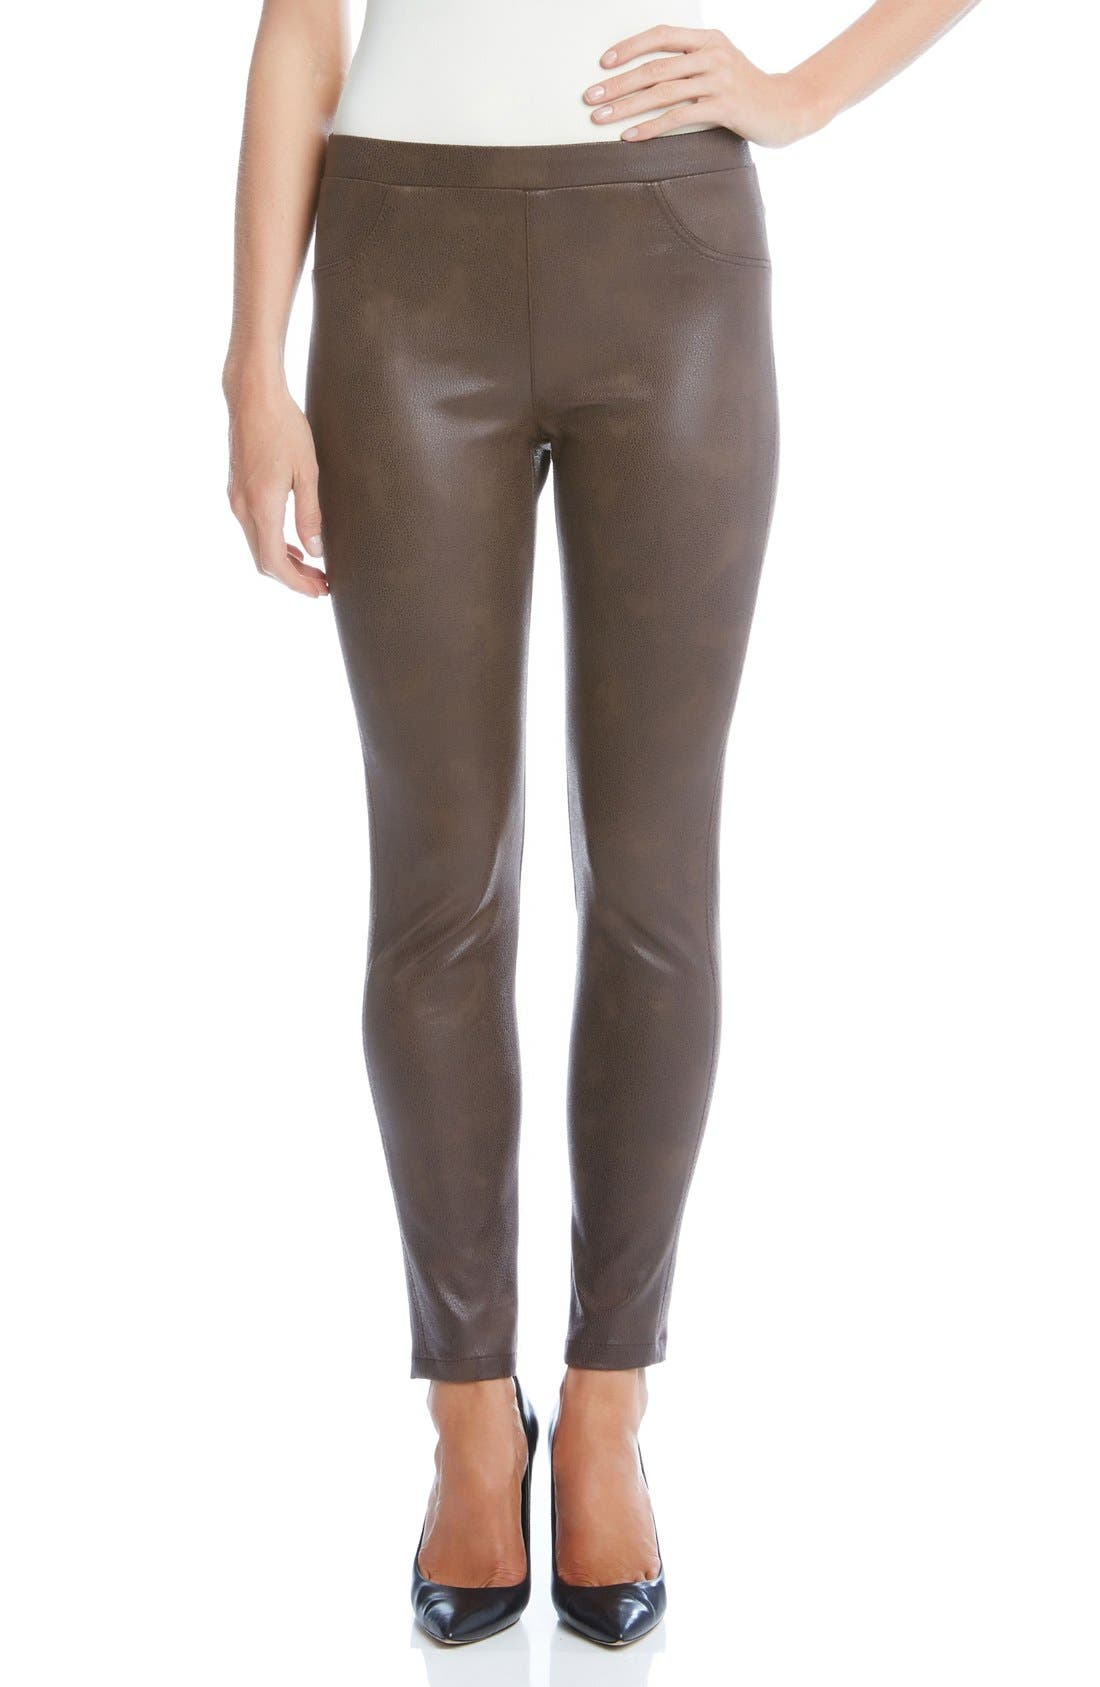 Karen Karen Stretch Faux Leather Skinny Pants,                         Main,                         color, 200